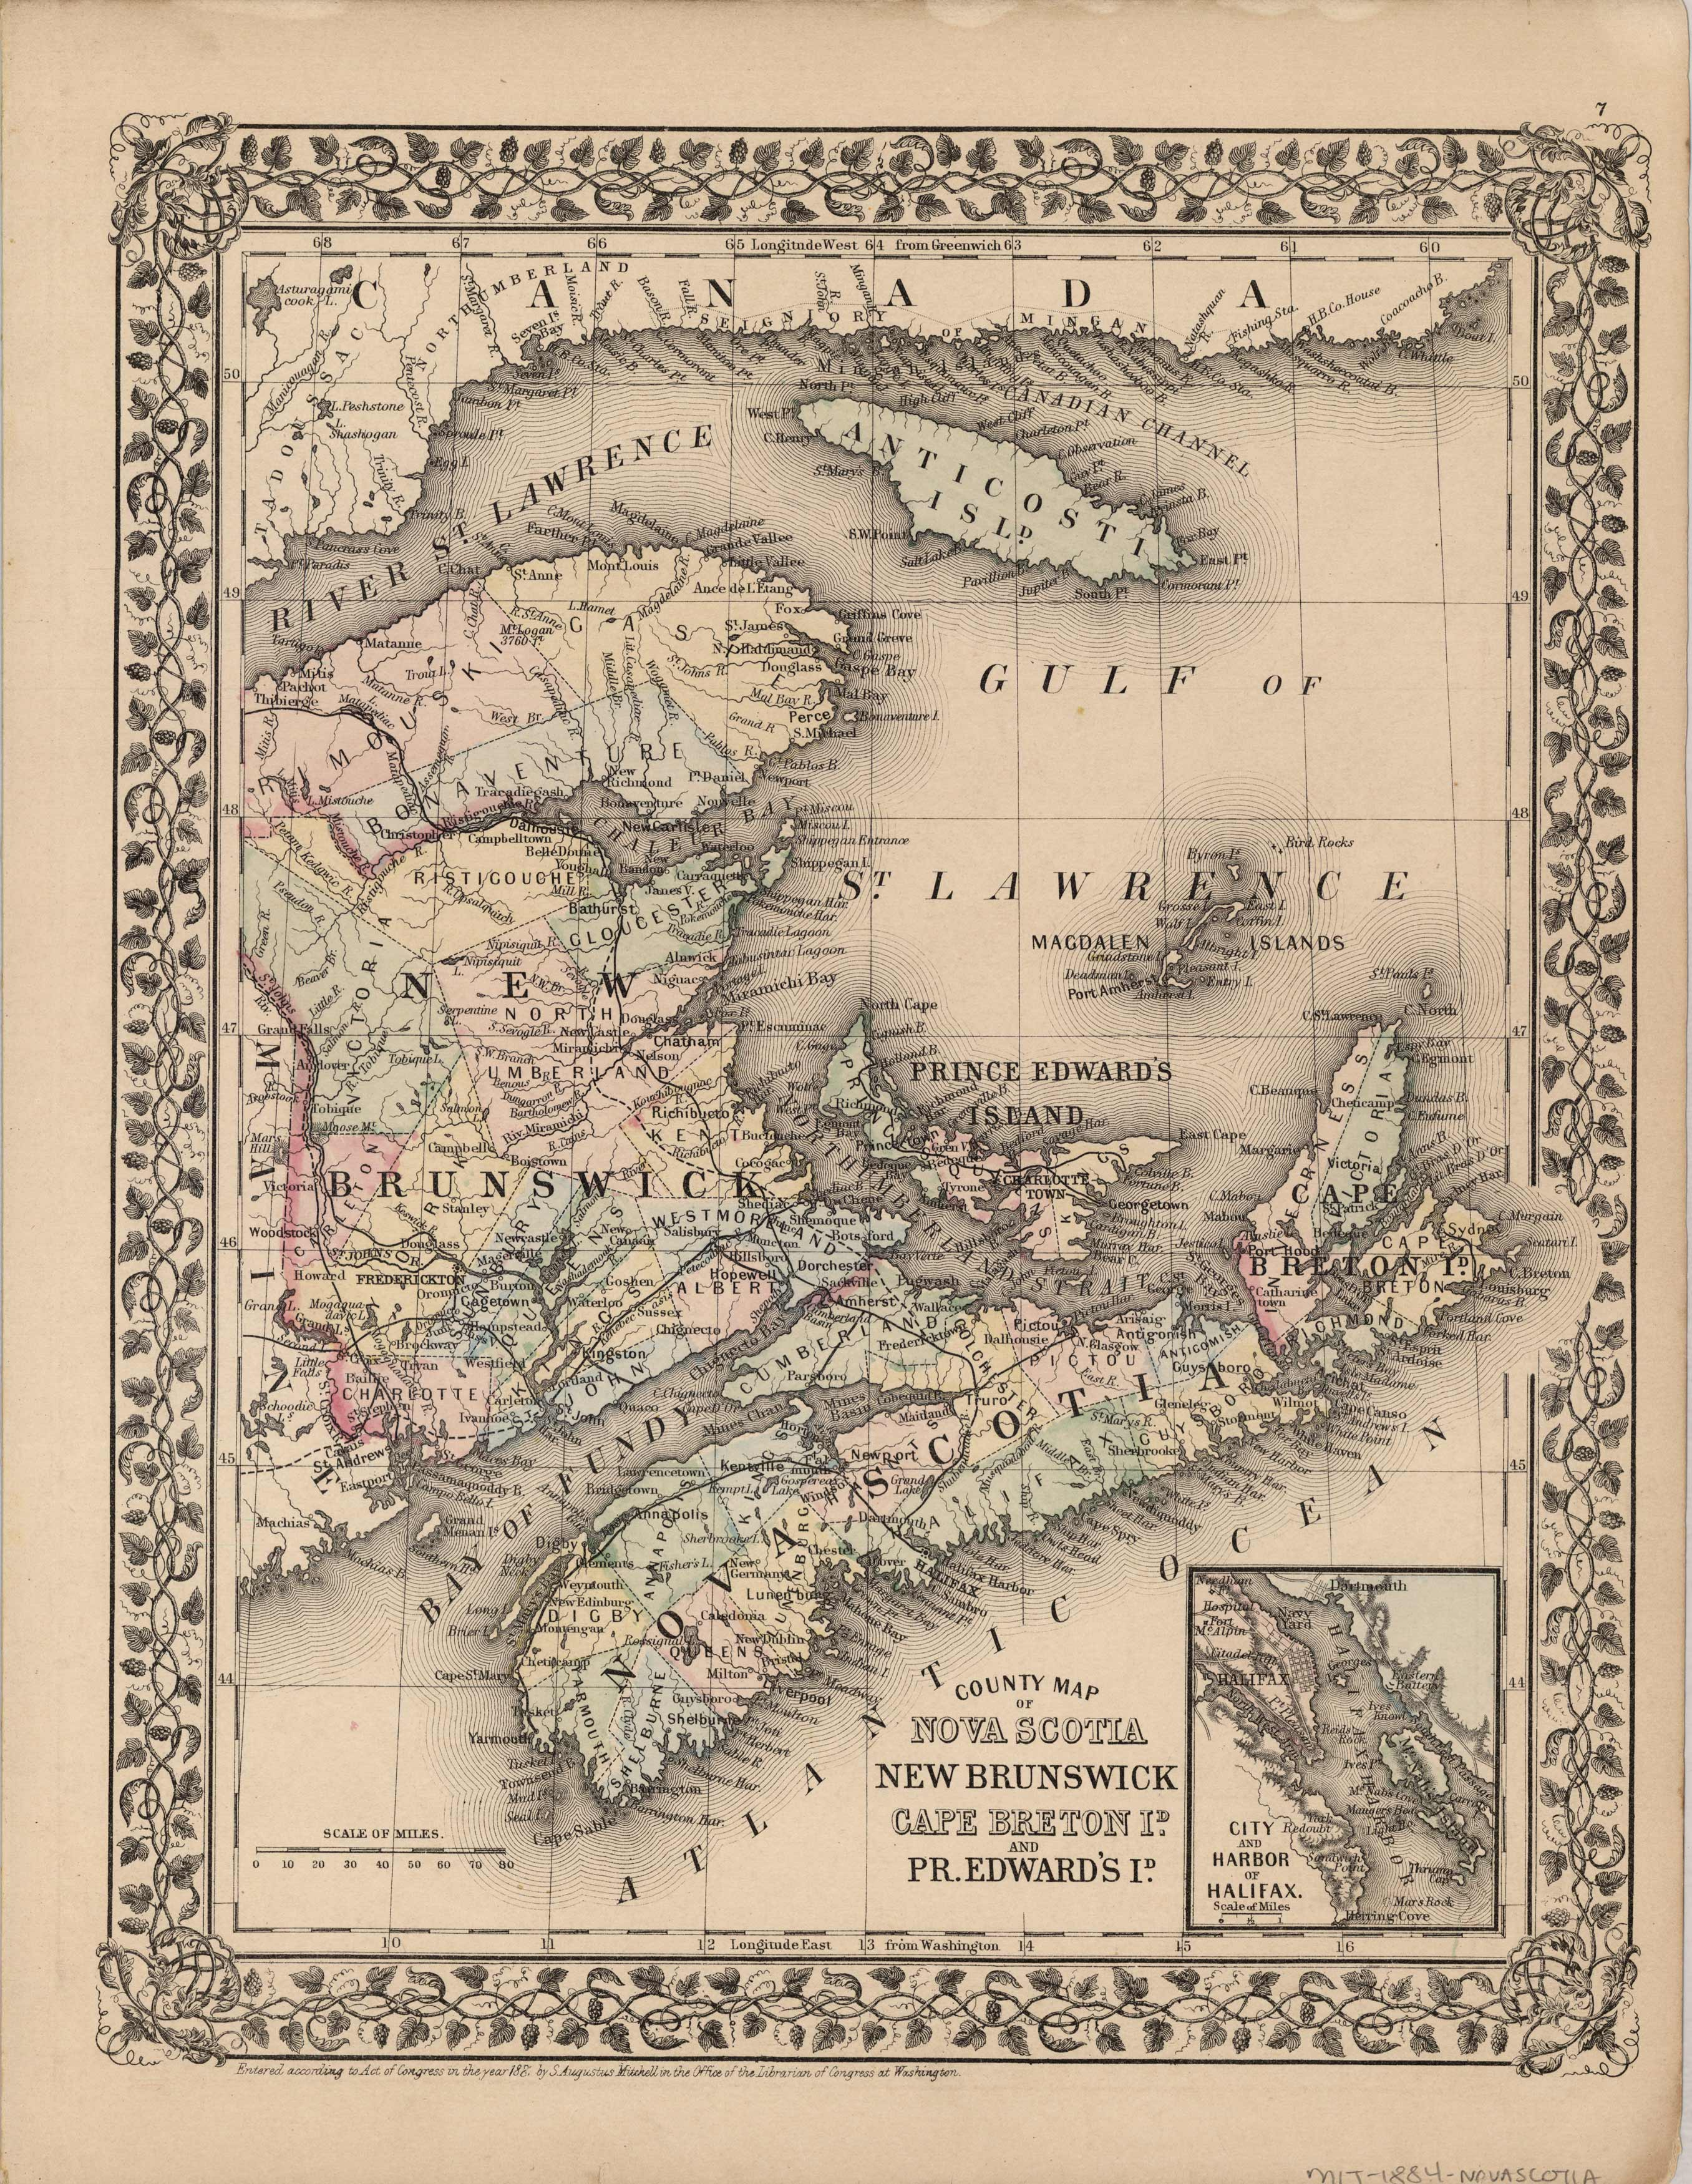 County Map of Nova Scotia